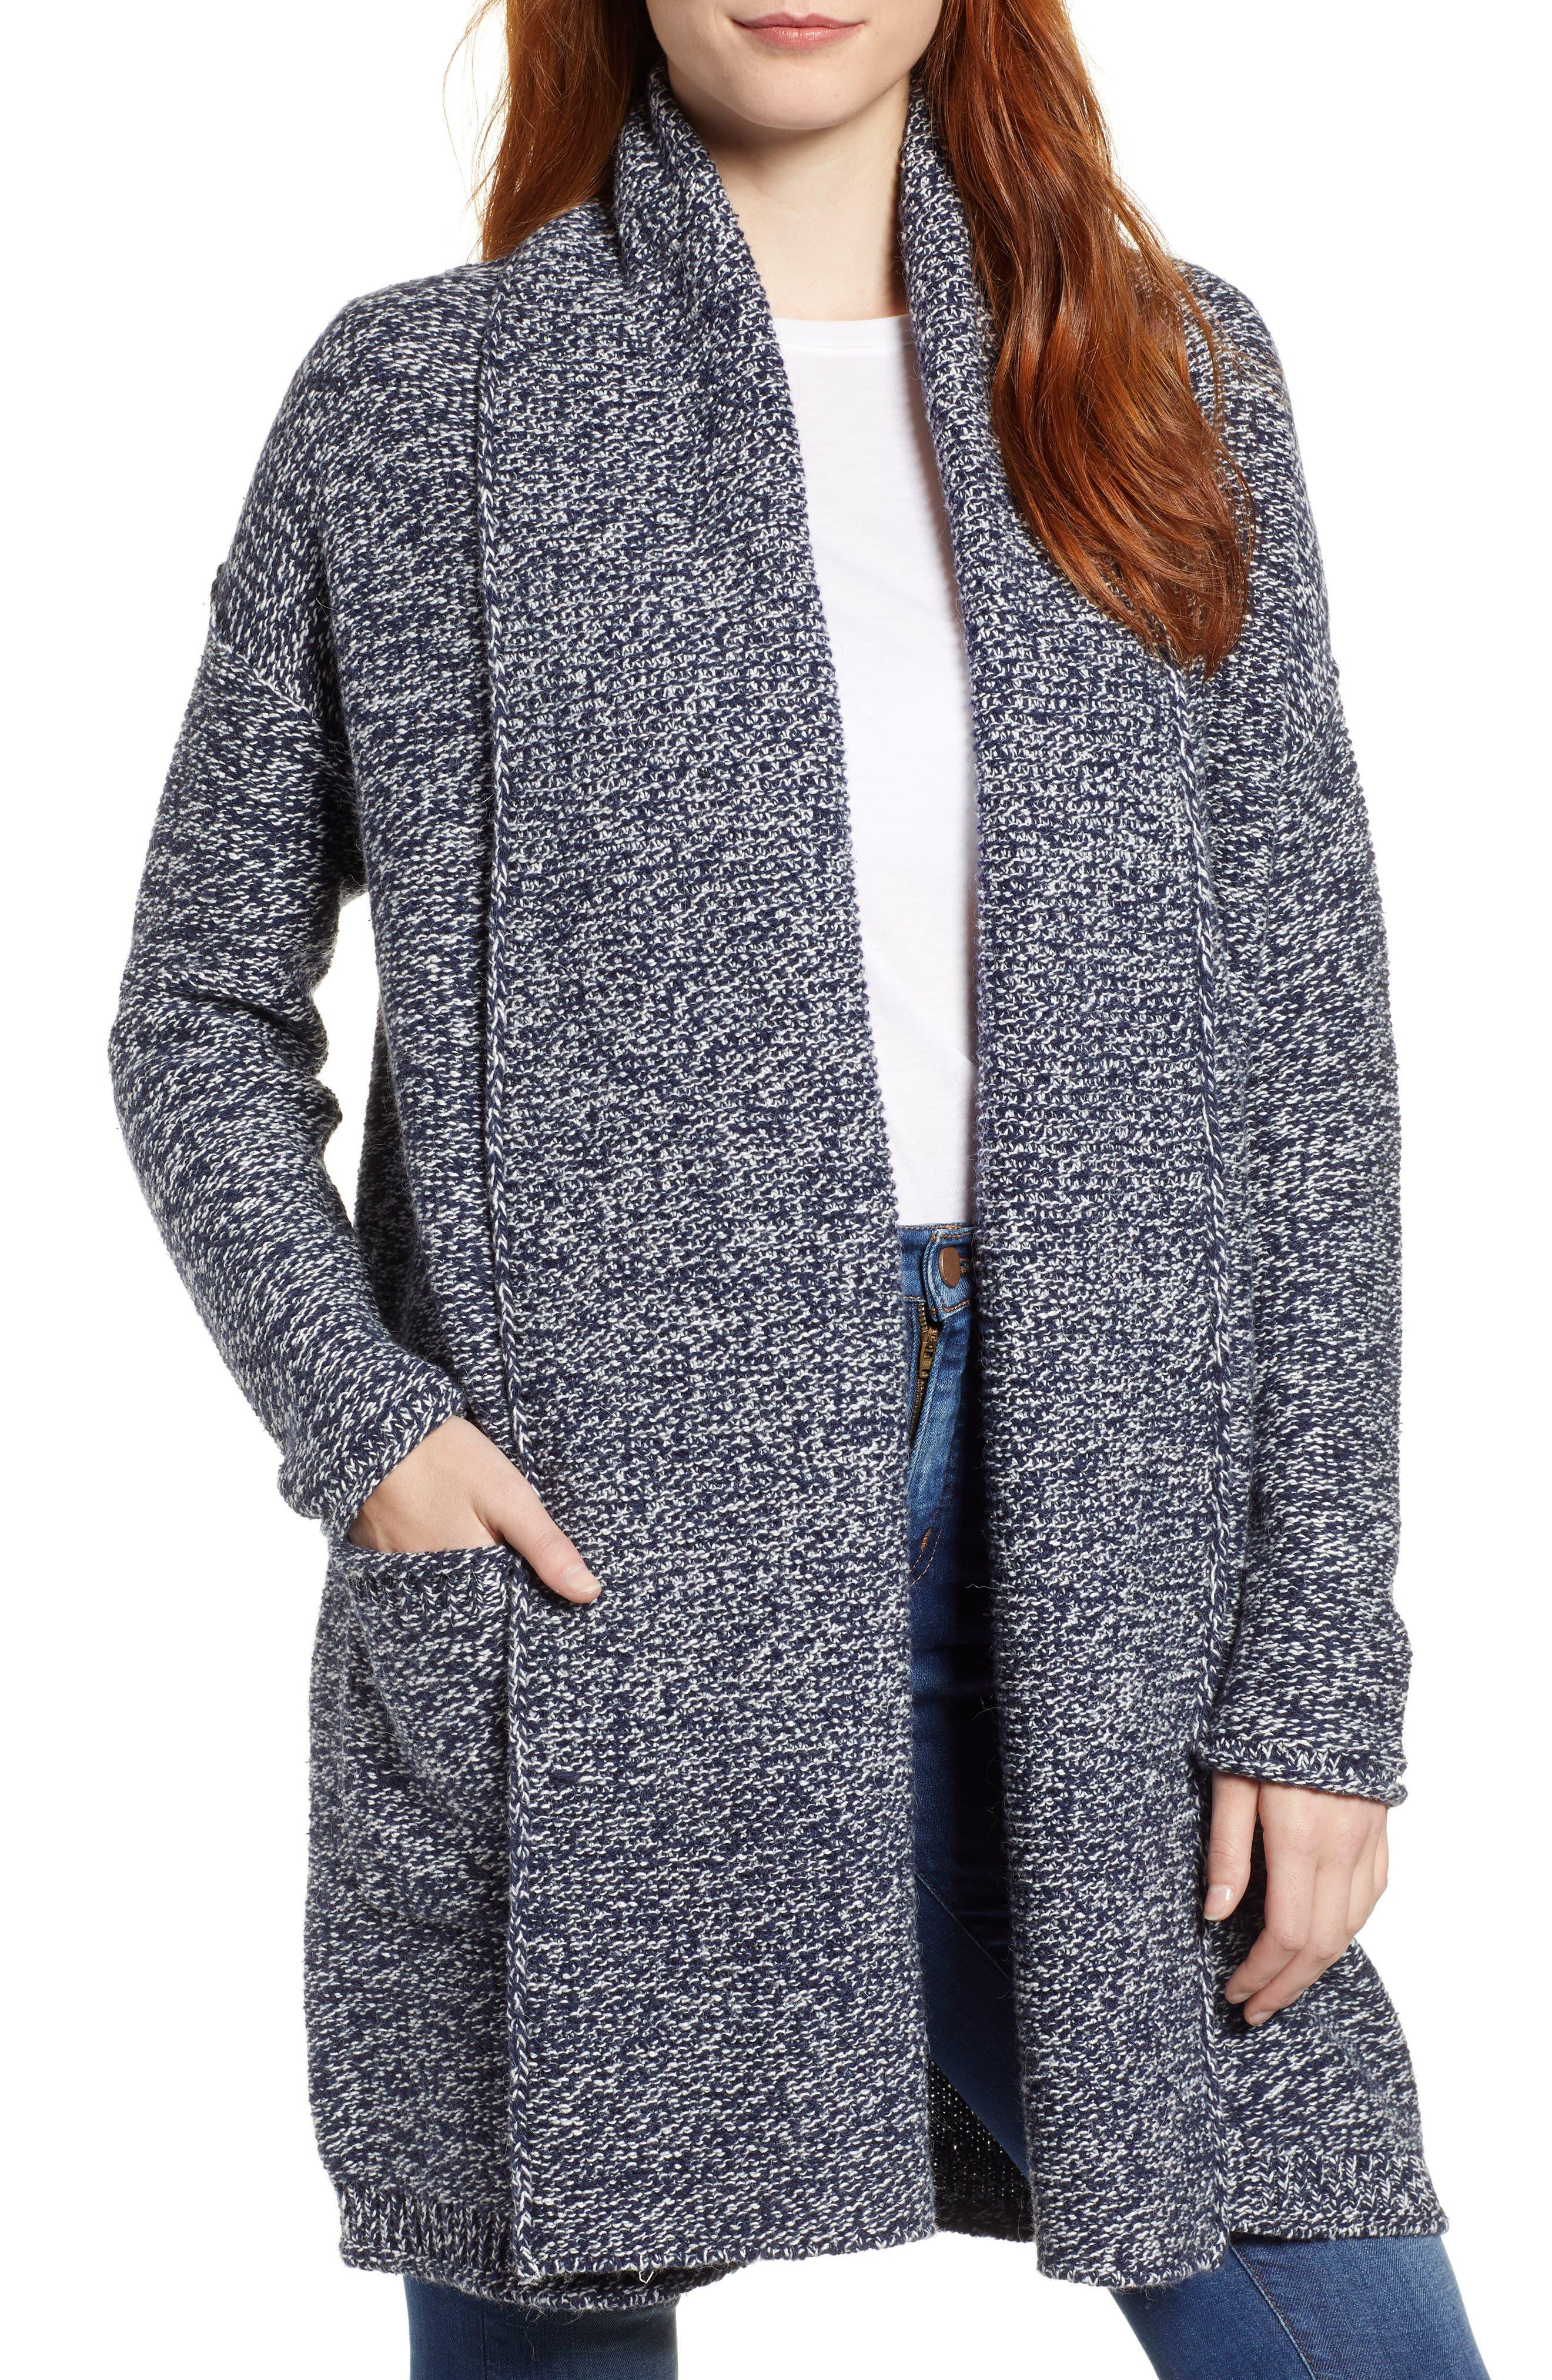 Shawl Collar Cardigan,                         Main,                         color, NAVY- WHITE MARL